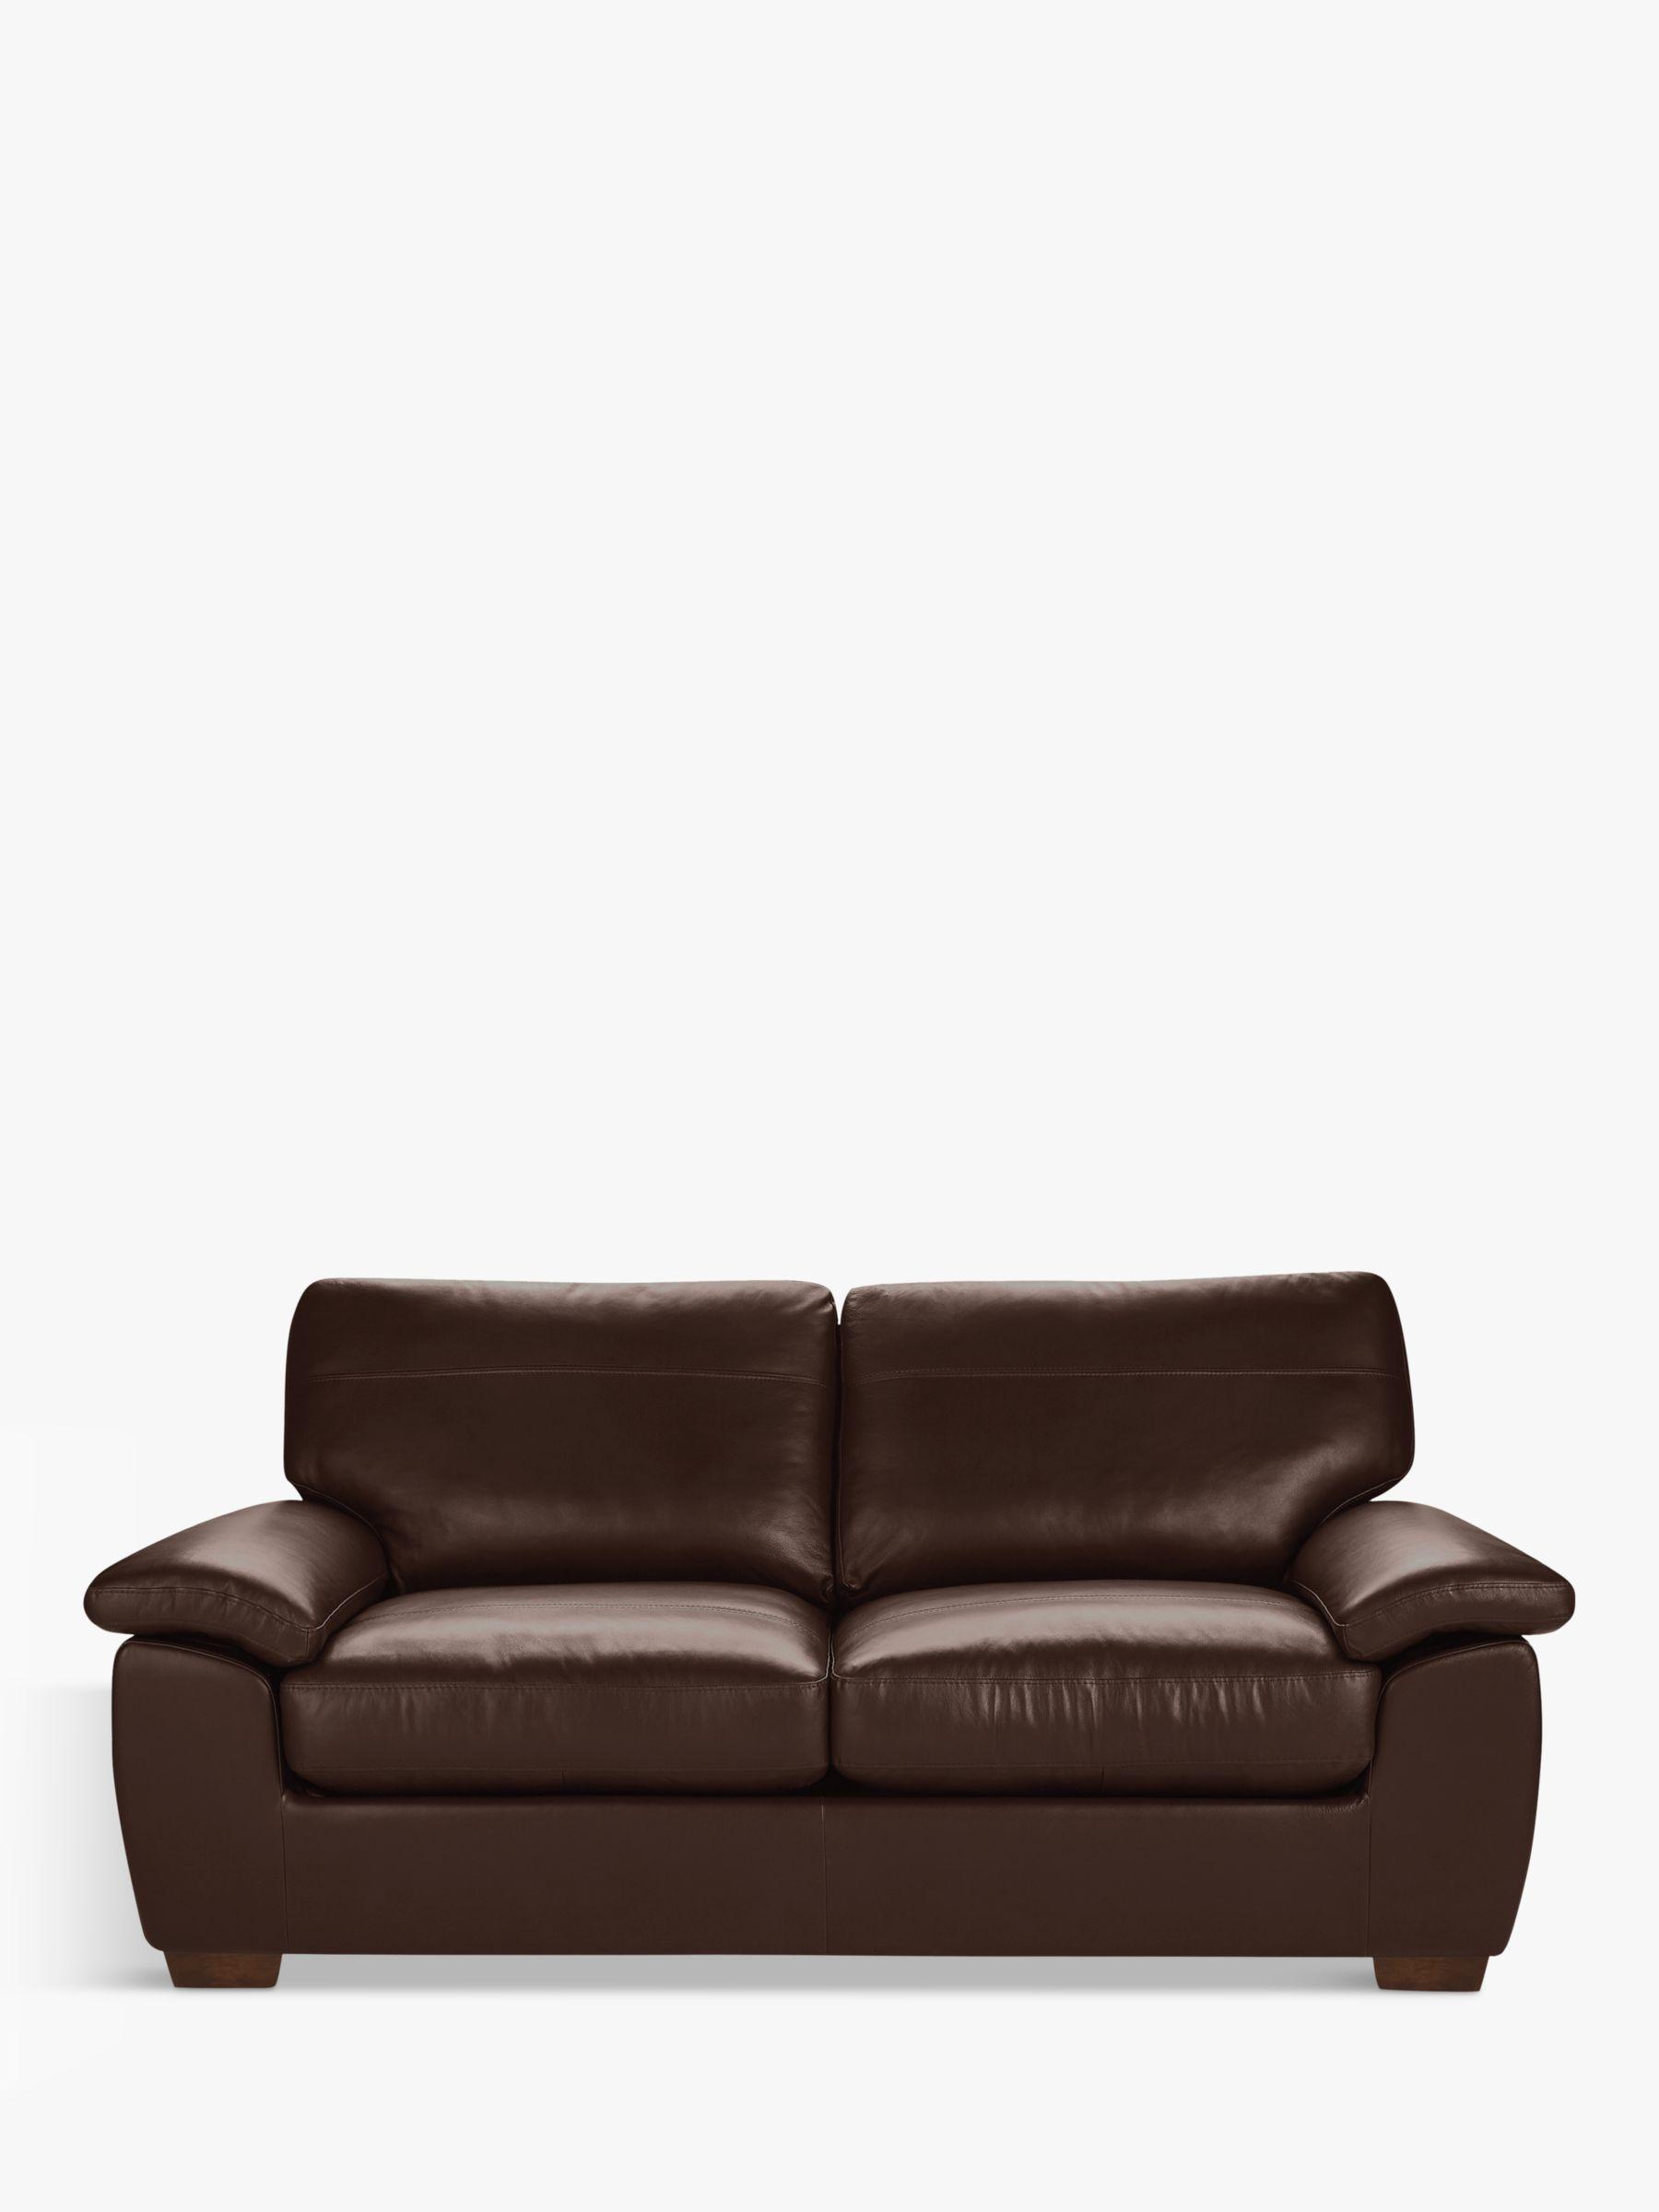 John Lewis & Partners Camden Large 3 Seater Leather Sofa, Dark Leg, Nature  Brown